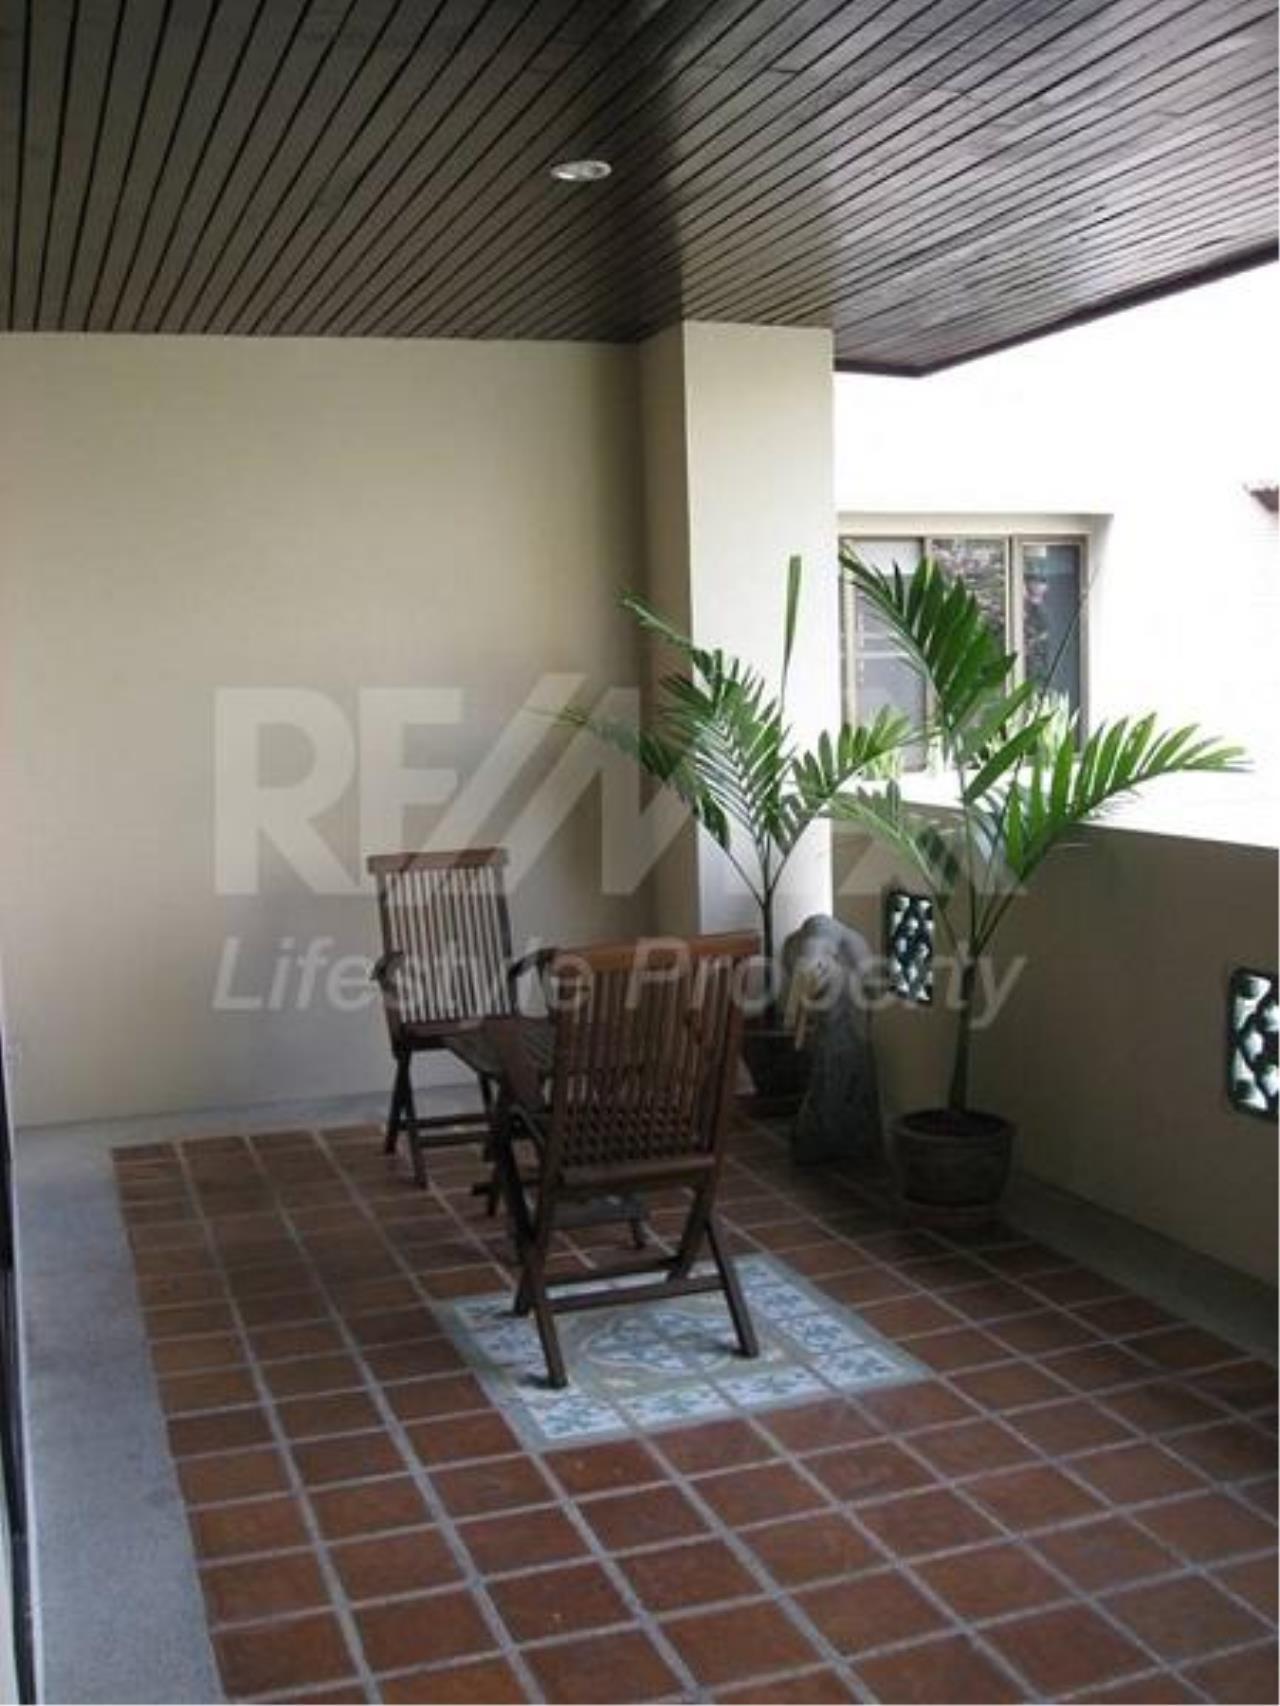 RE/MAX LifeStyle Property Agency's Raintree Village Apartment 8